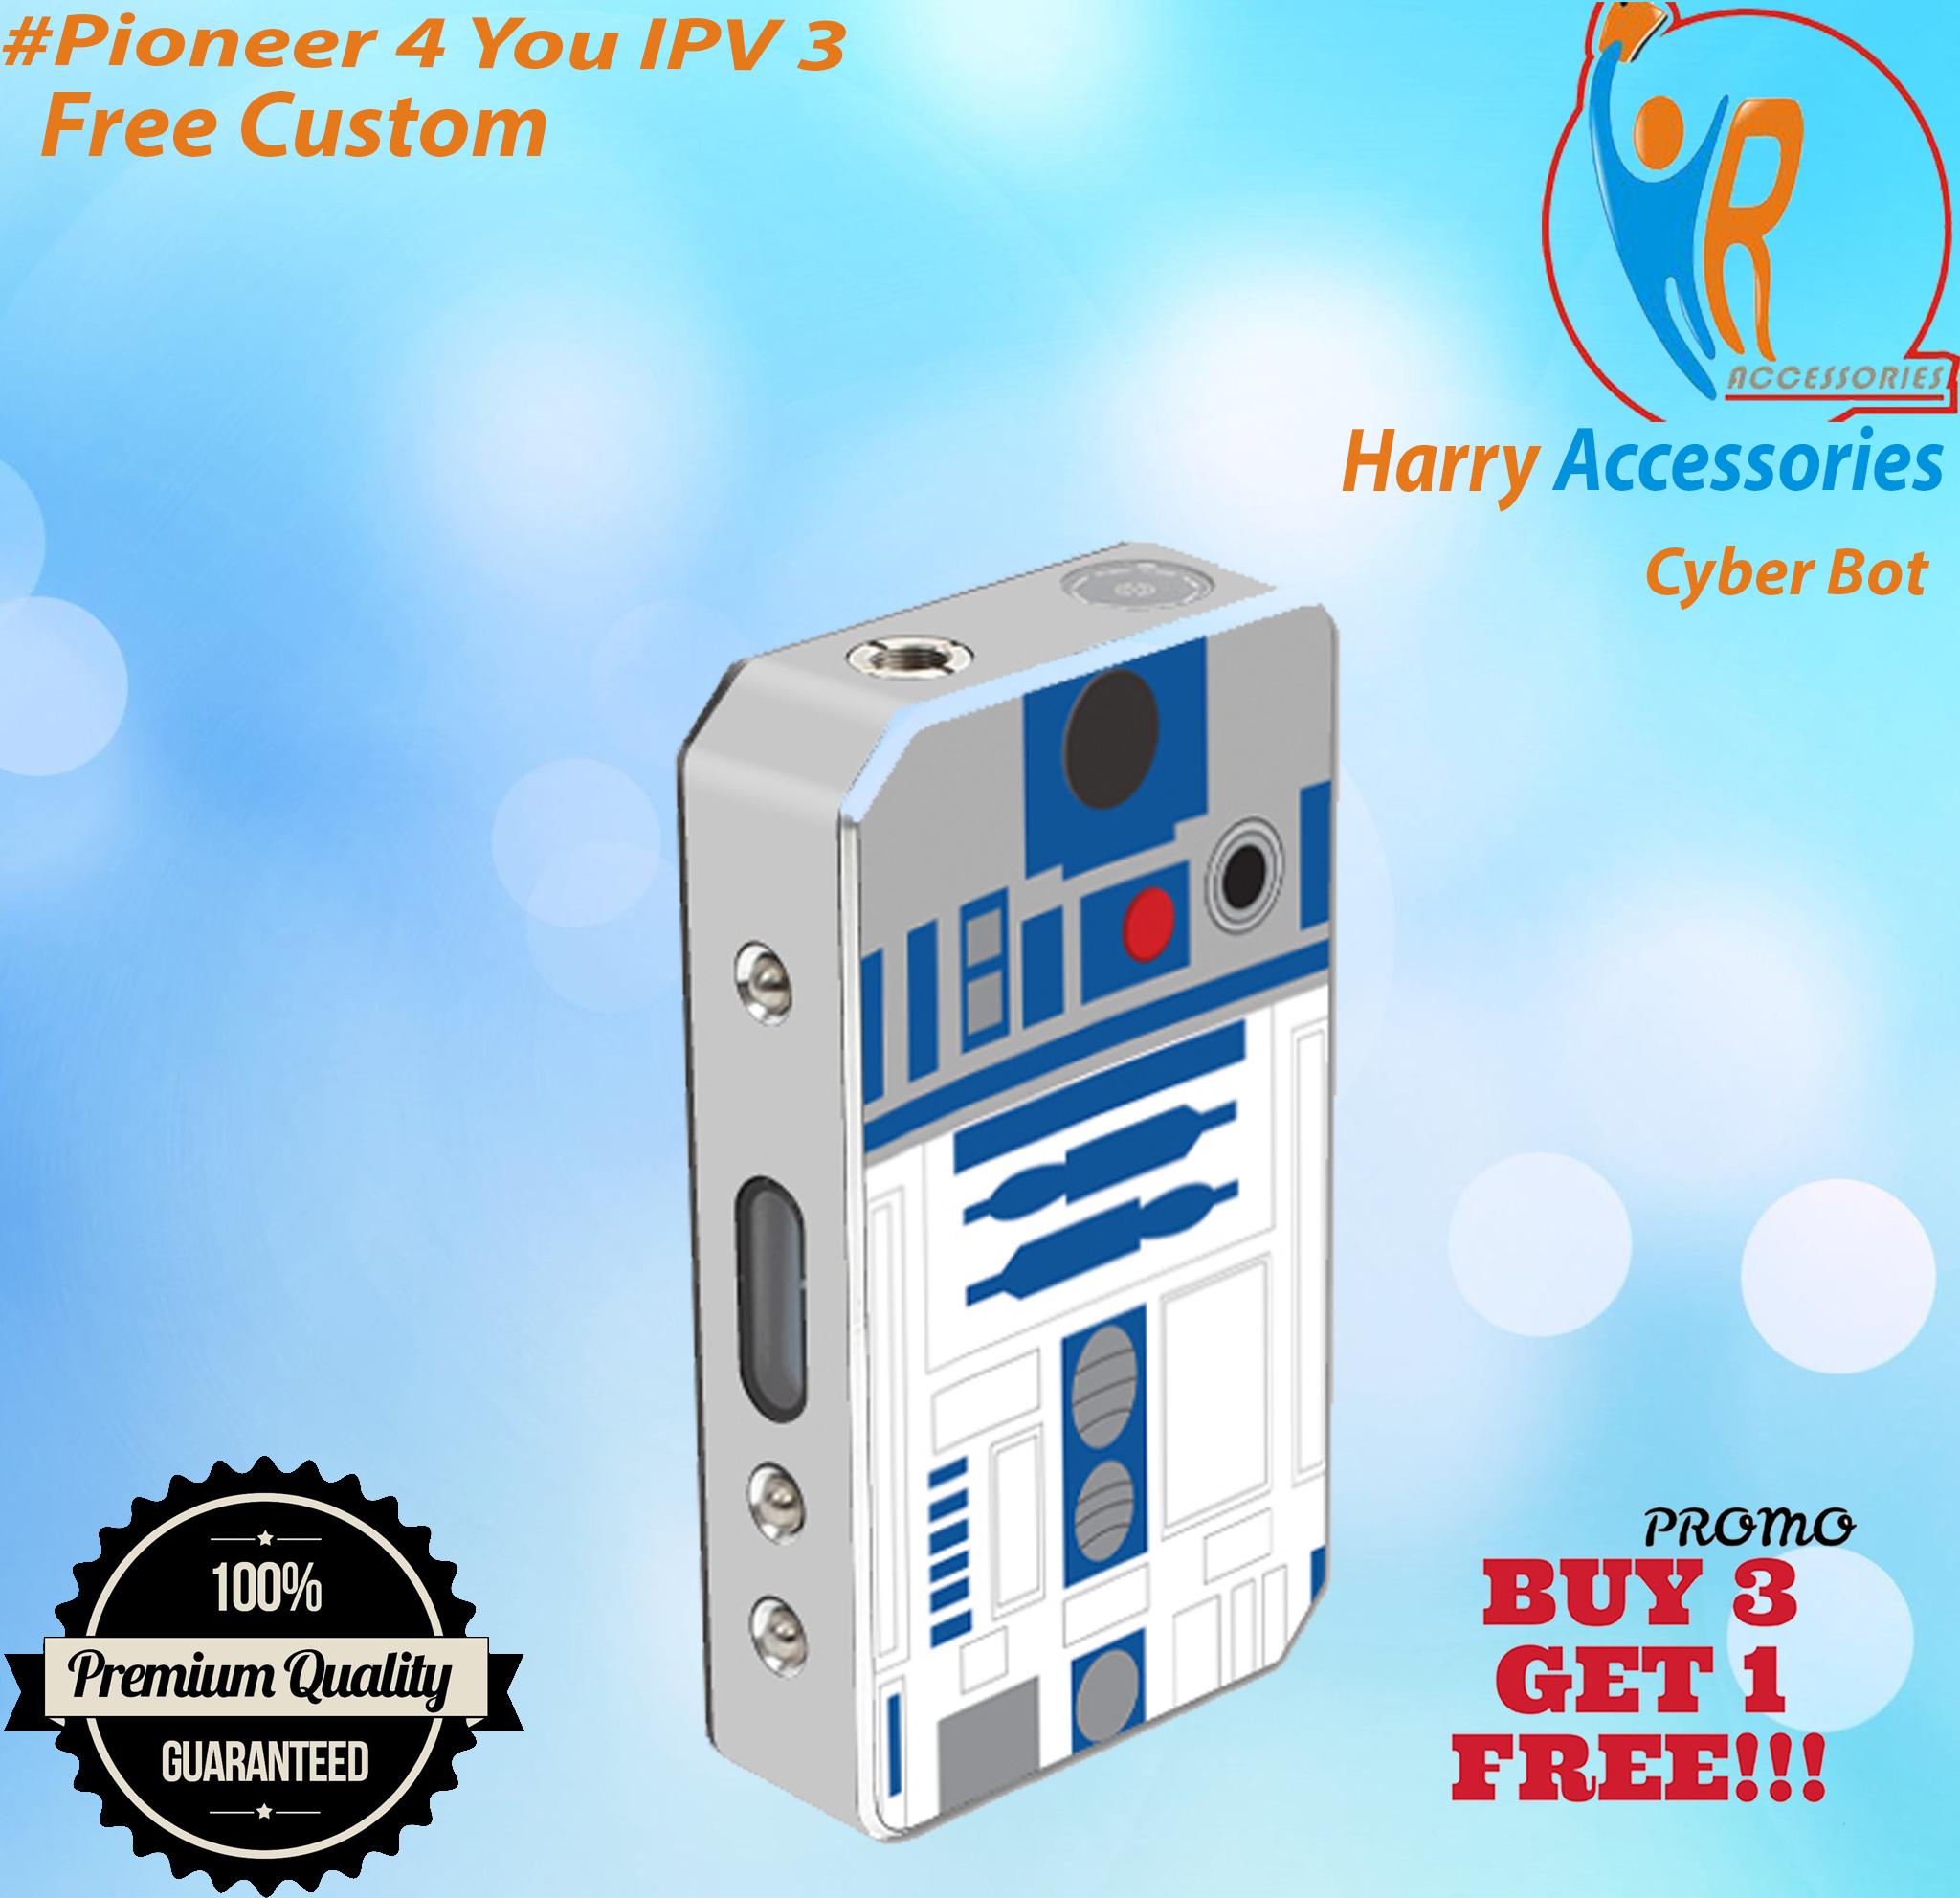 Jual [Promo] Garskin Mod Vapor Pioneer 4 You IPV 3 -Cyber